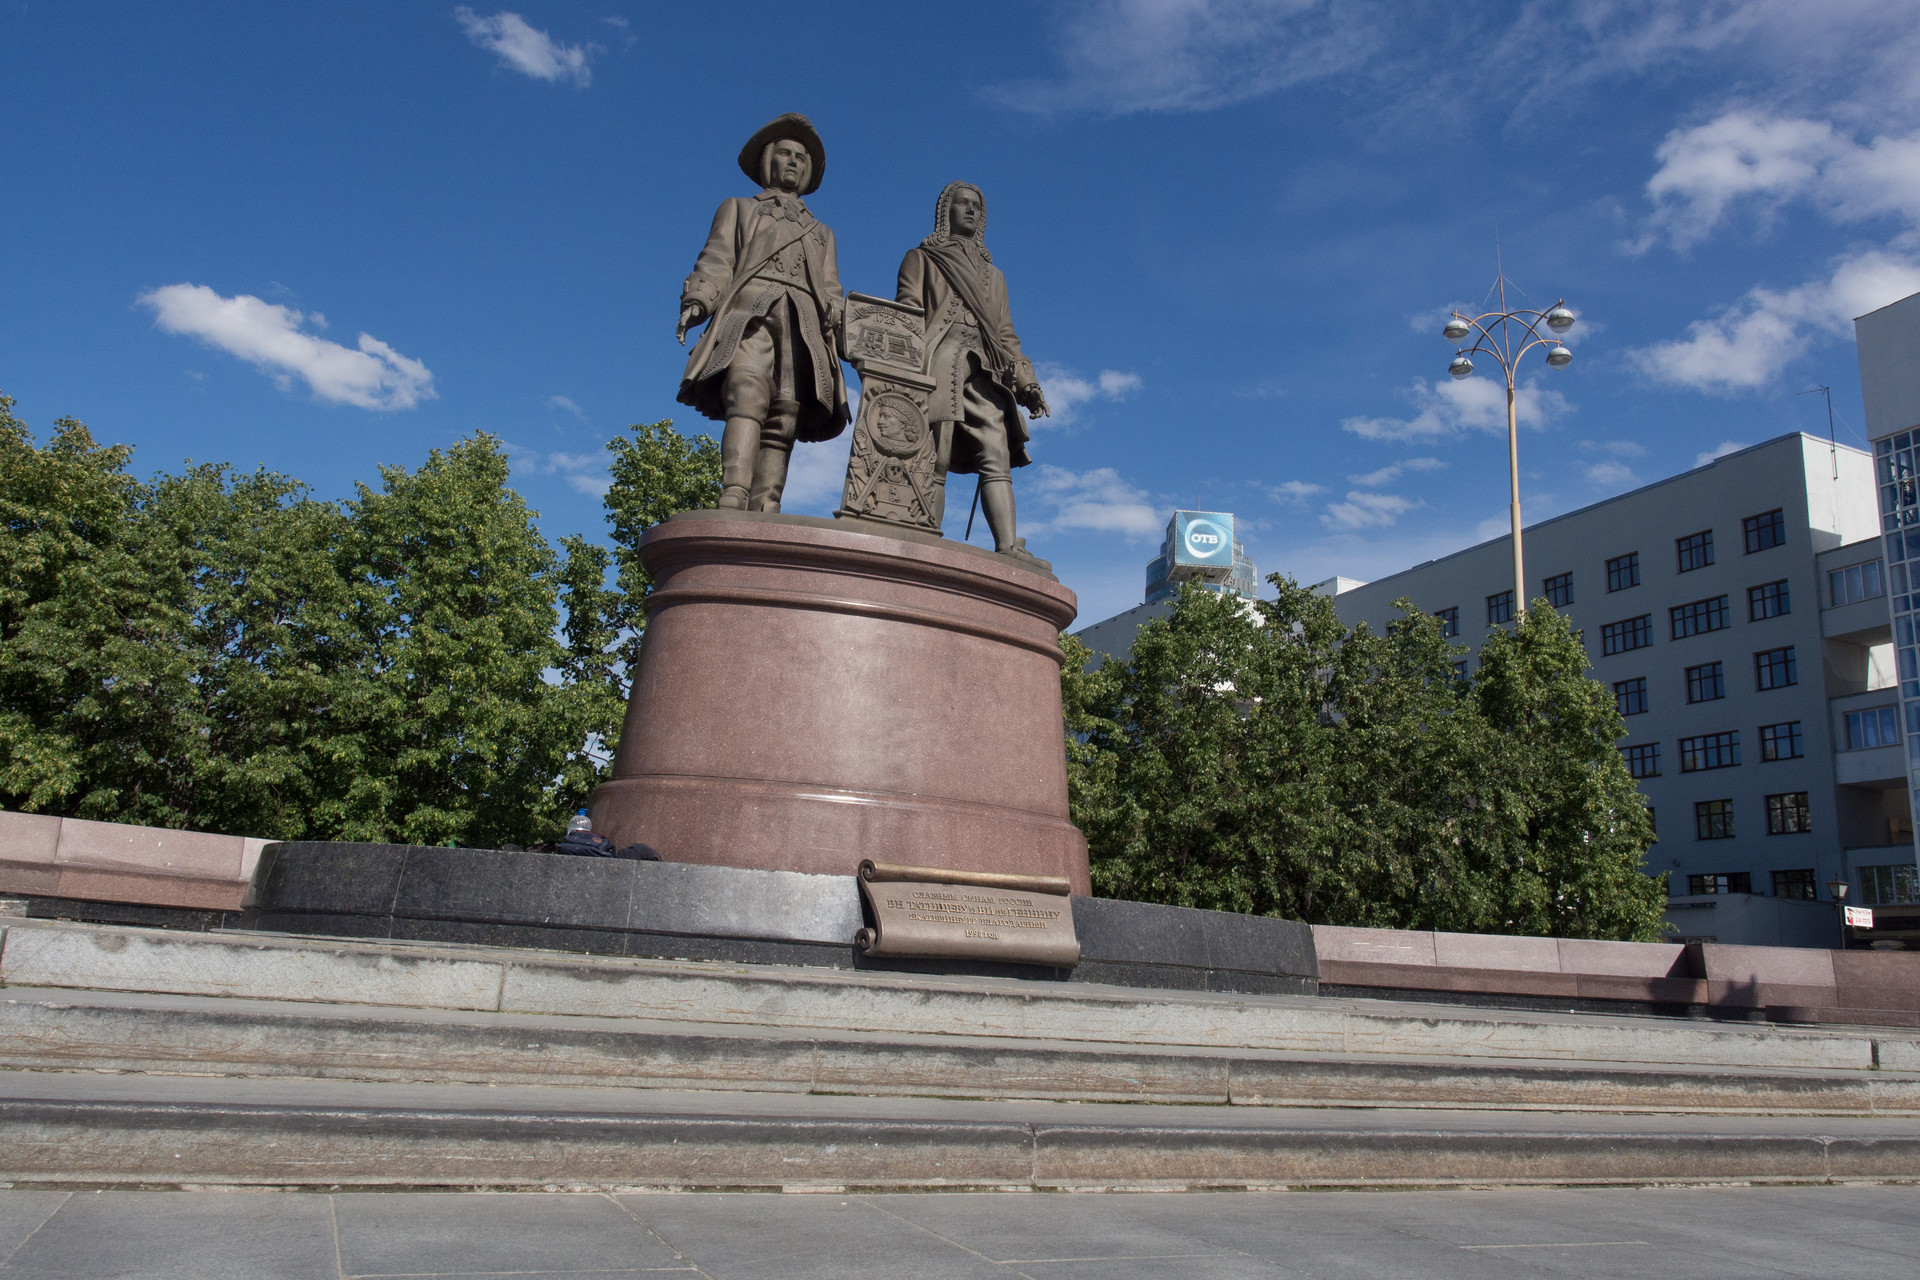 Spomenik ustanoviteljema mesta, Tatisčevu in de Genninu